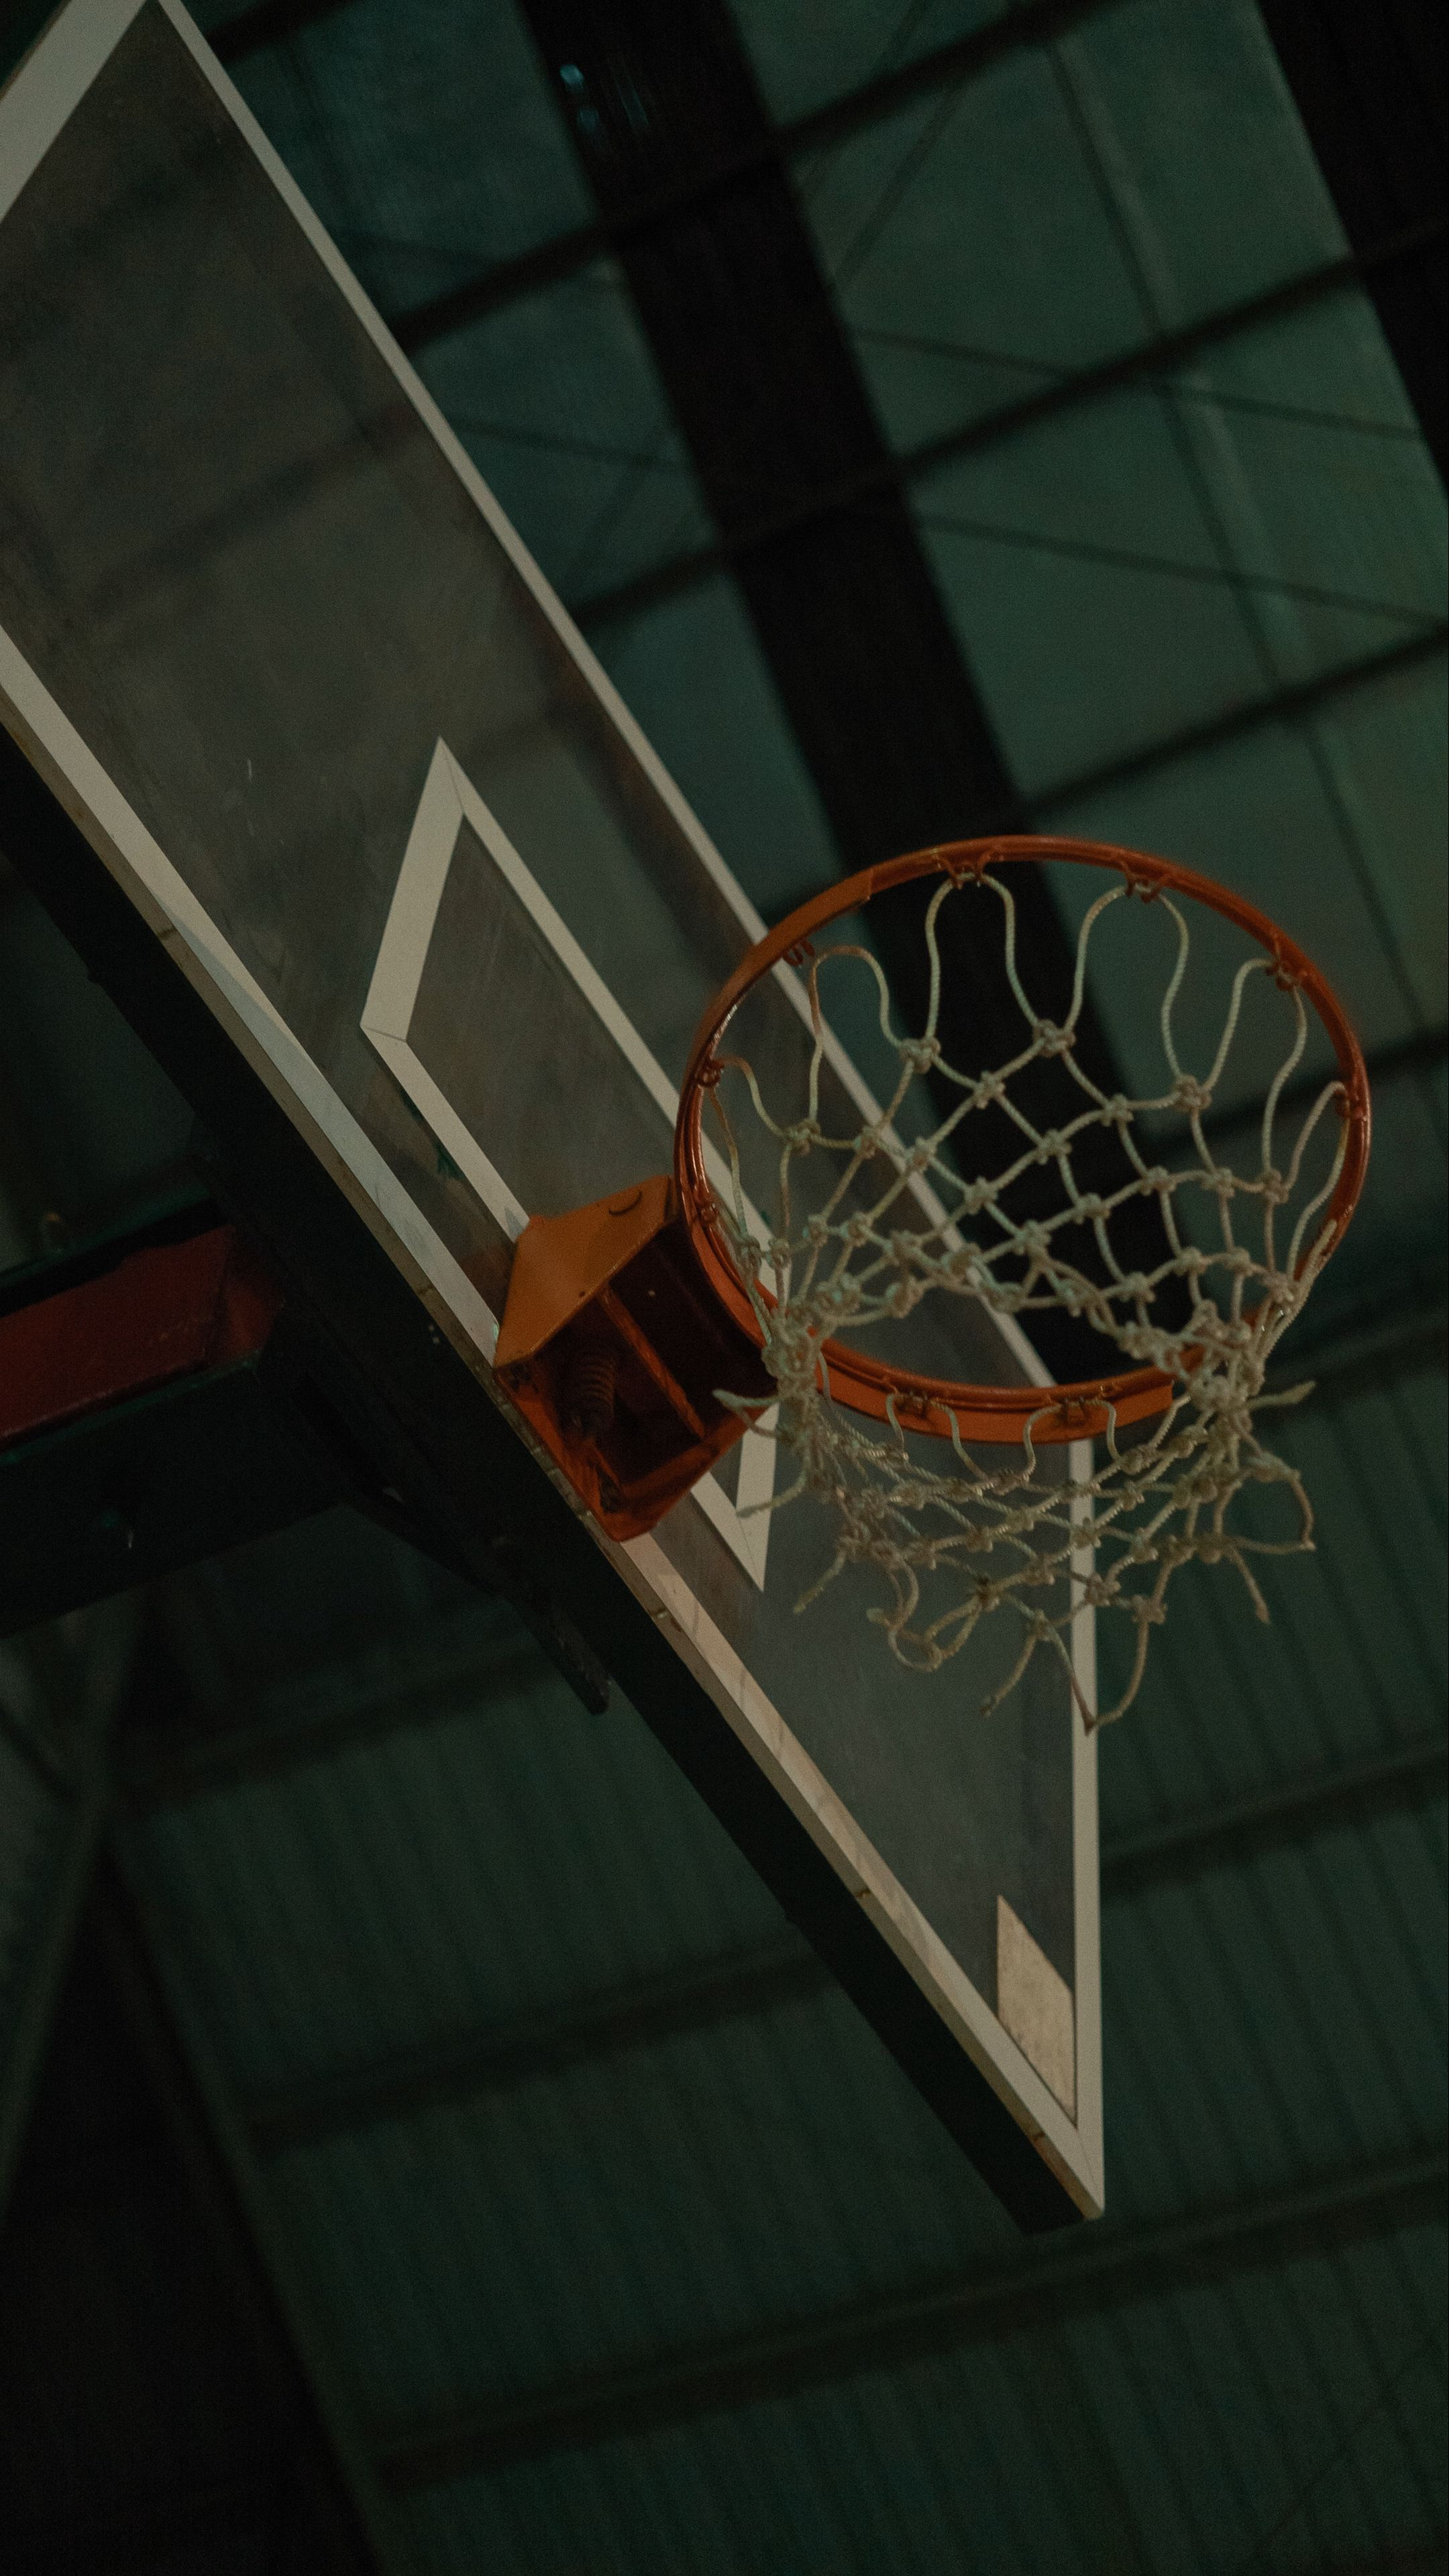 2160x3840 Wallpaper basketball, basketball net, basketball hoop, stadium, basketball backboard